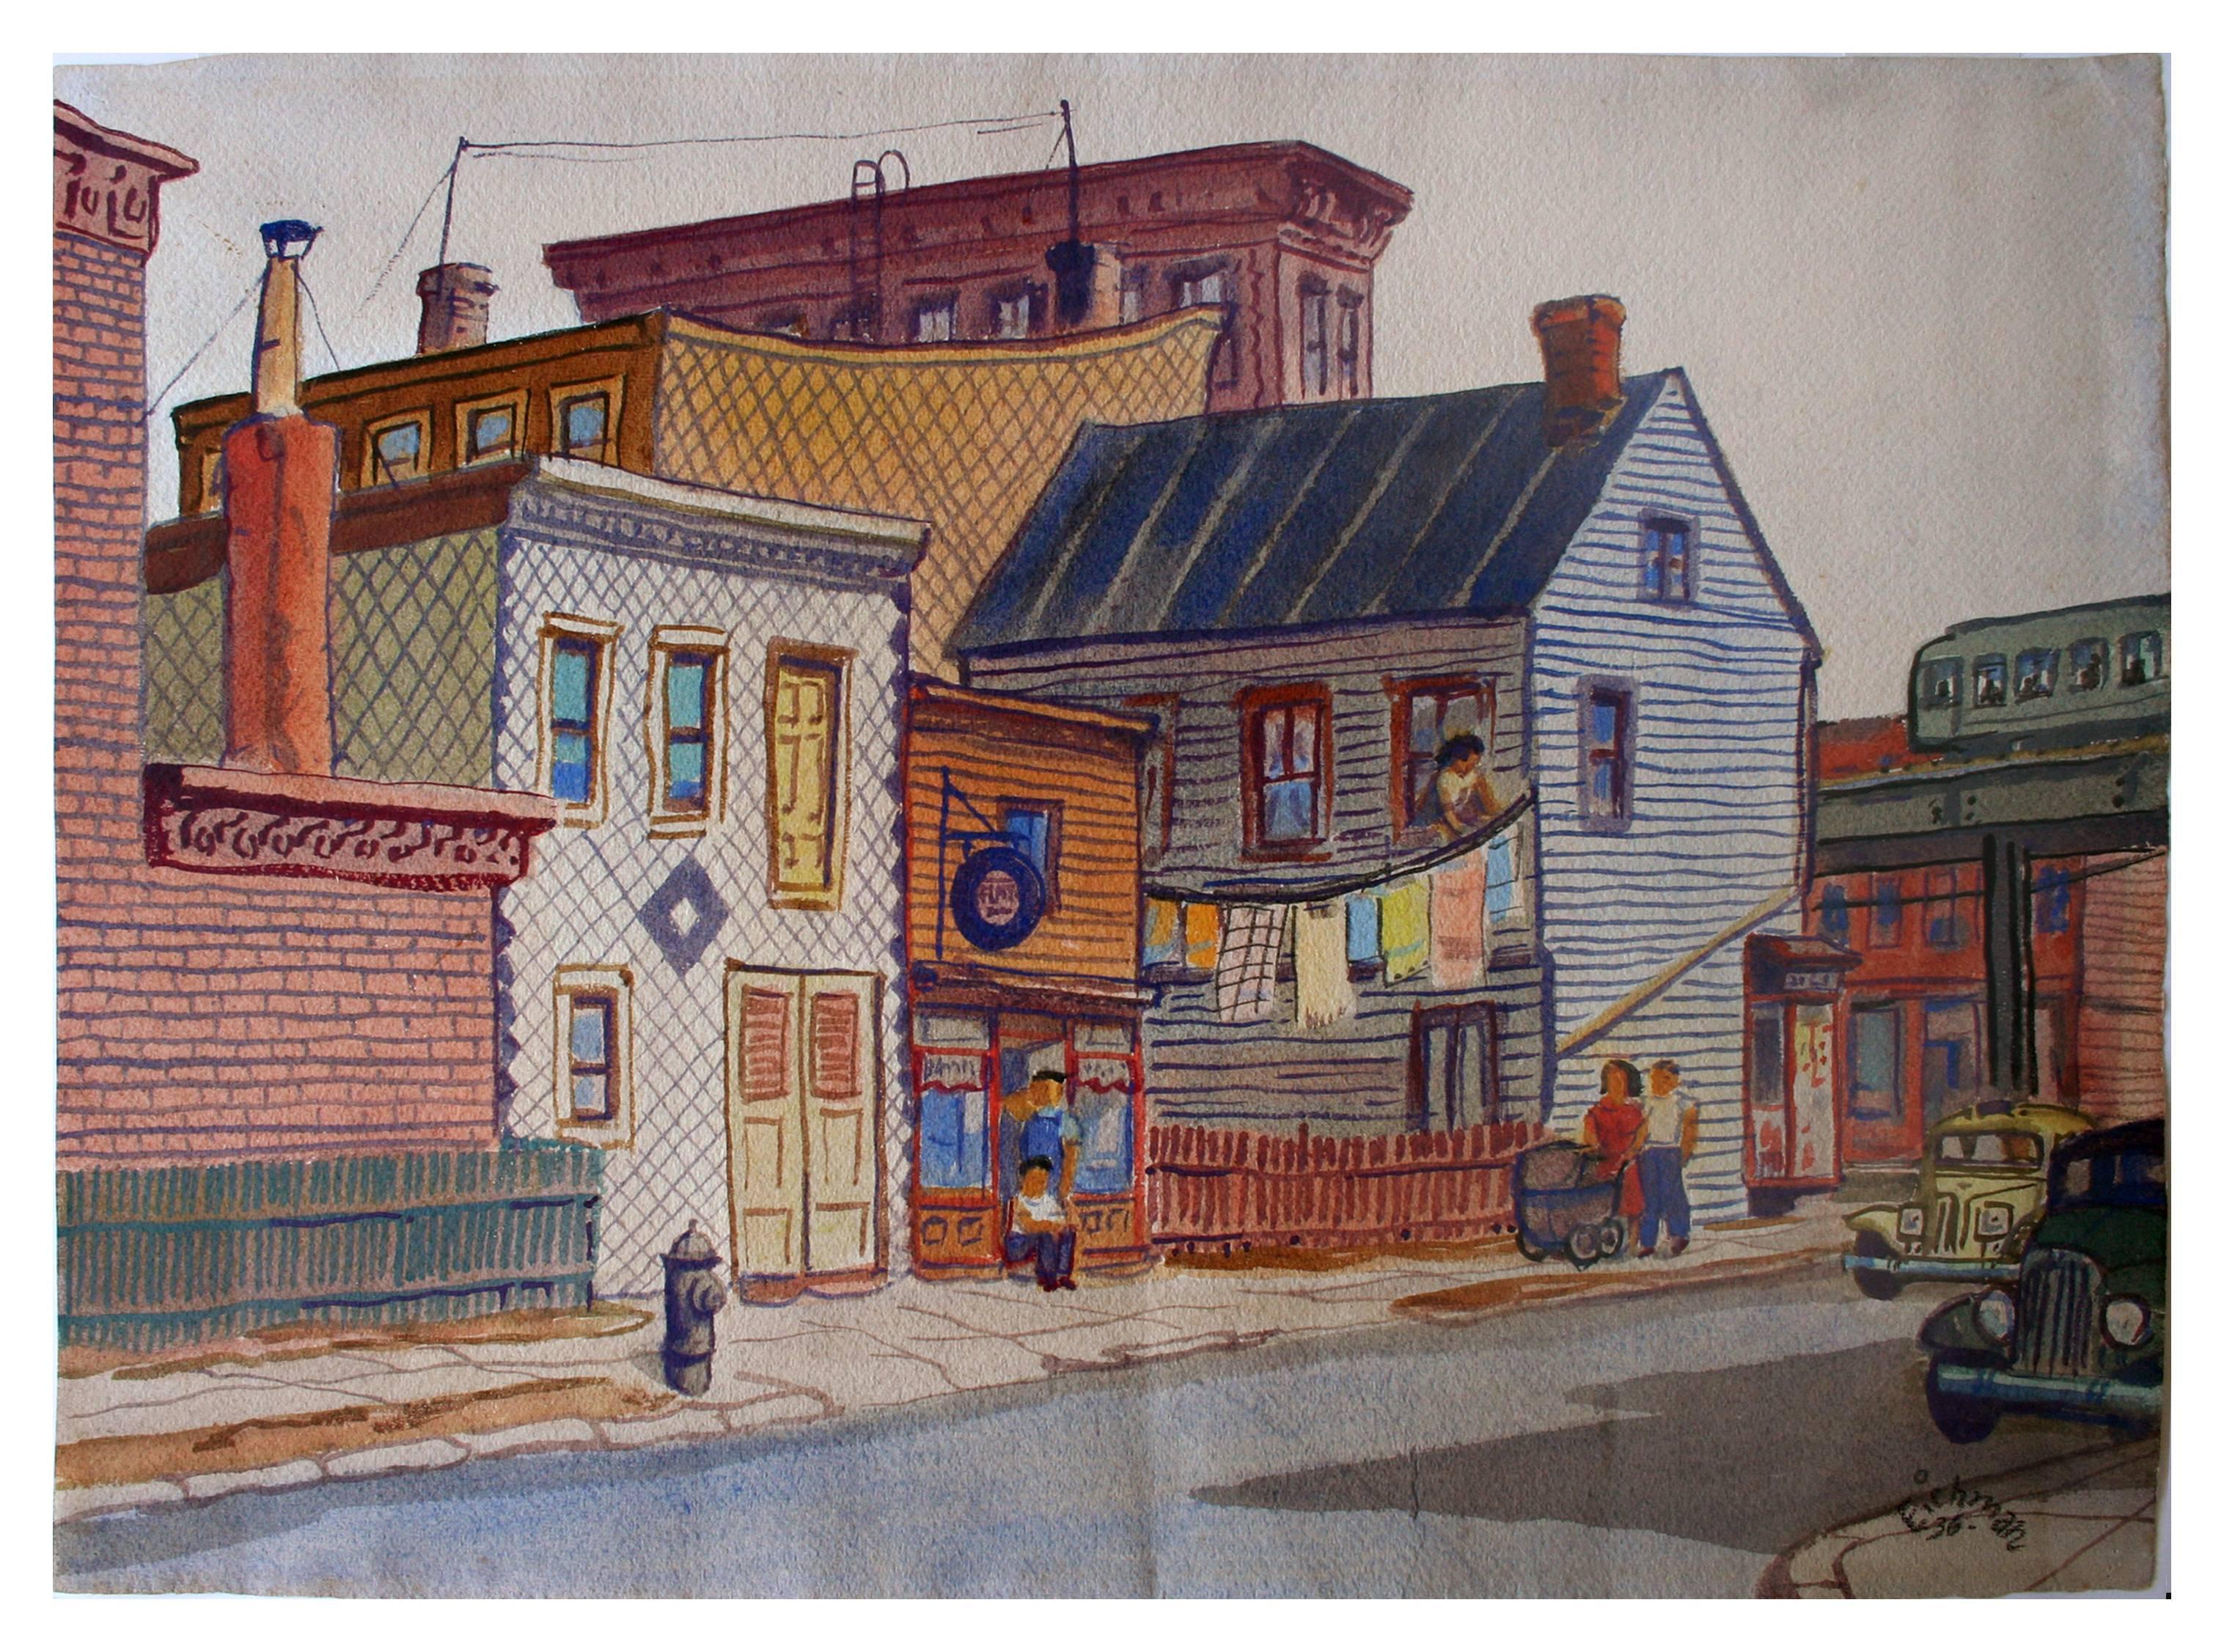 Society of Six Street Scene - Figurative Abstract